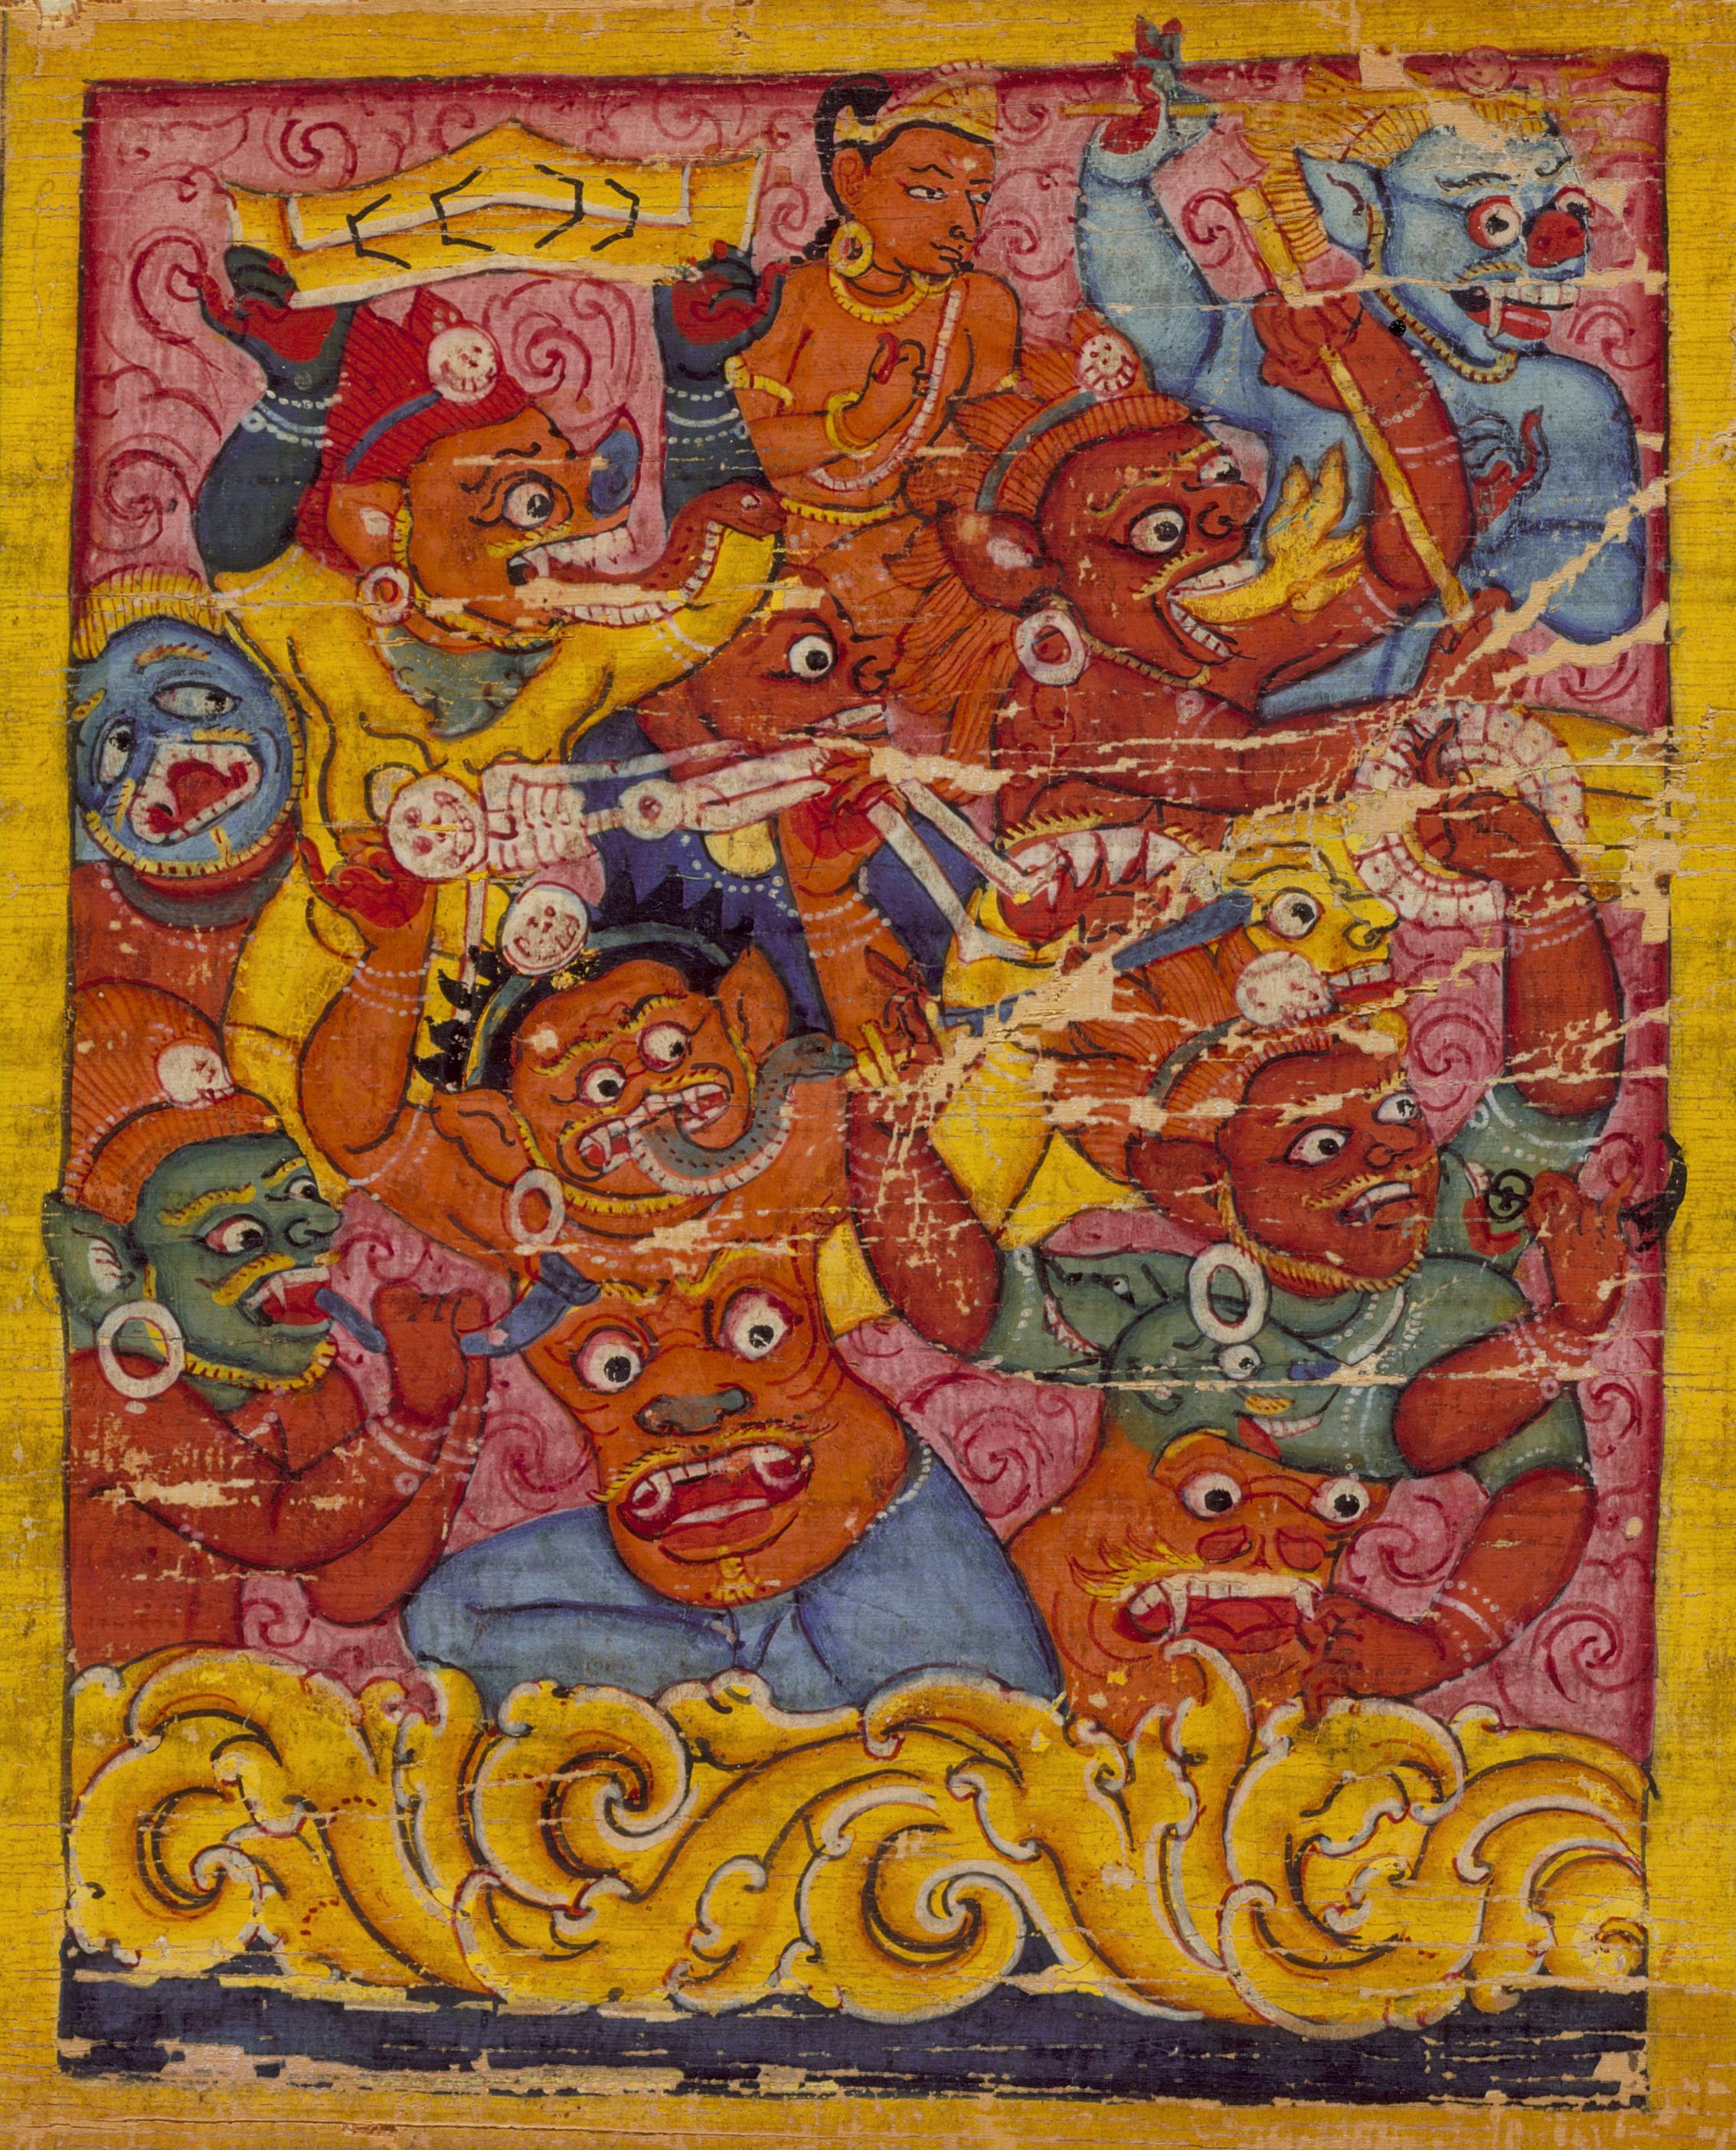 tibetan book of the dead wiki